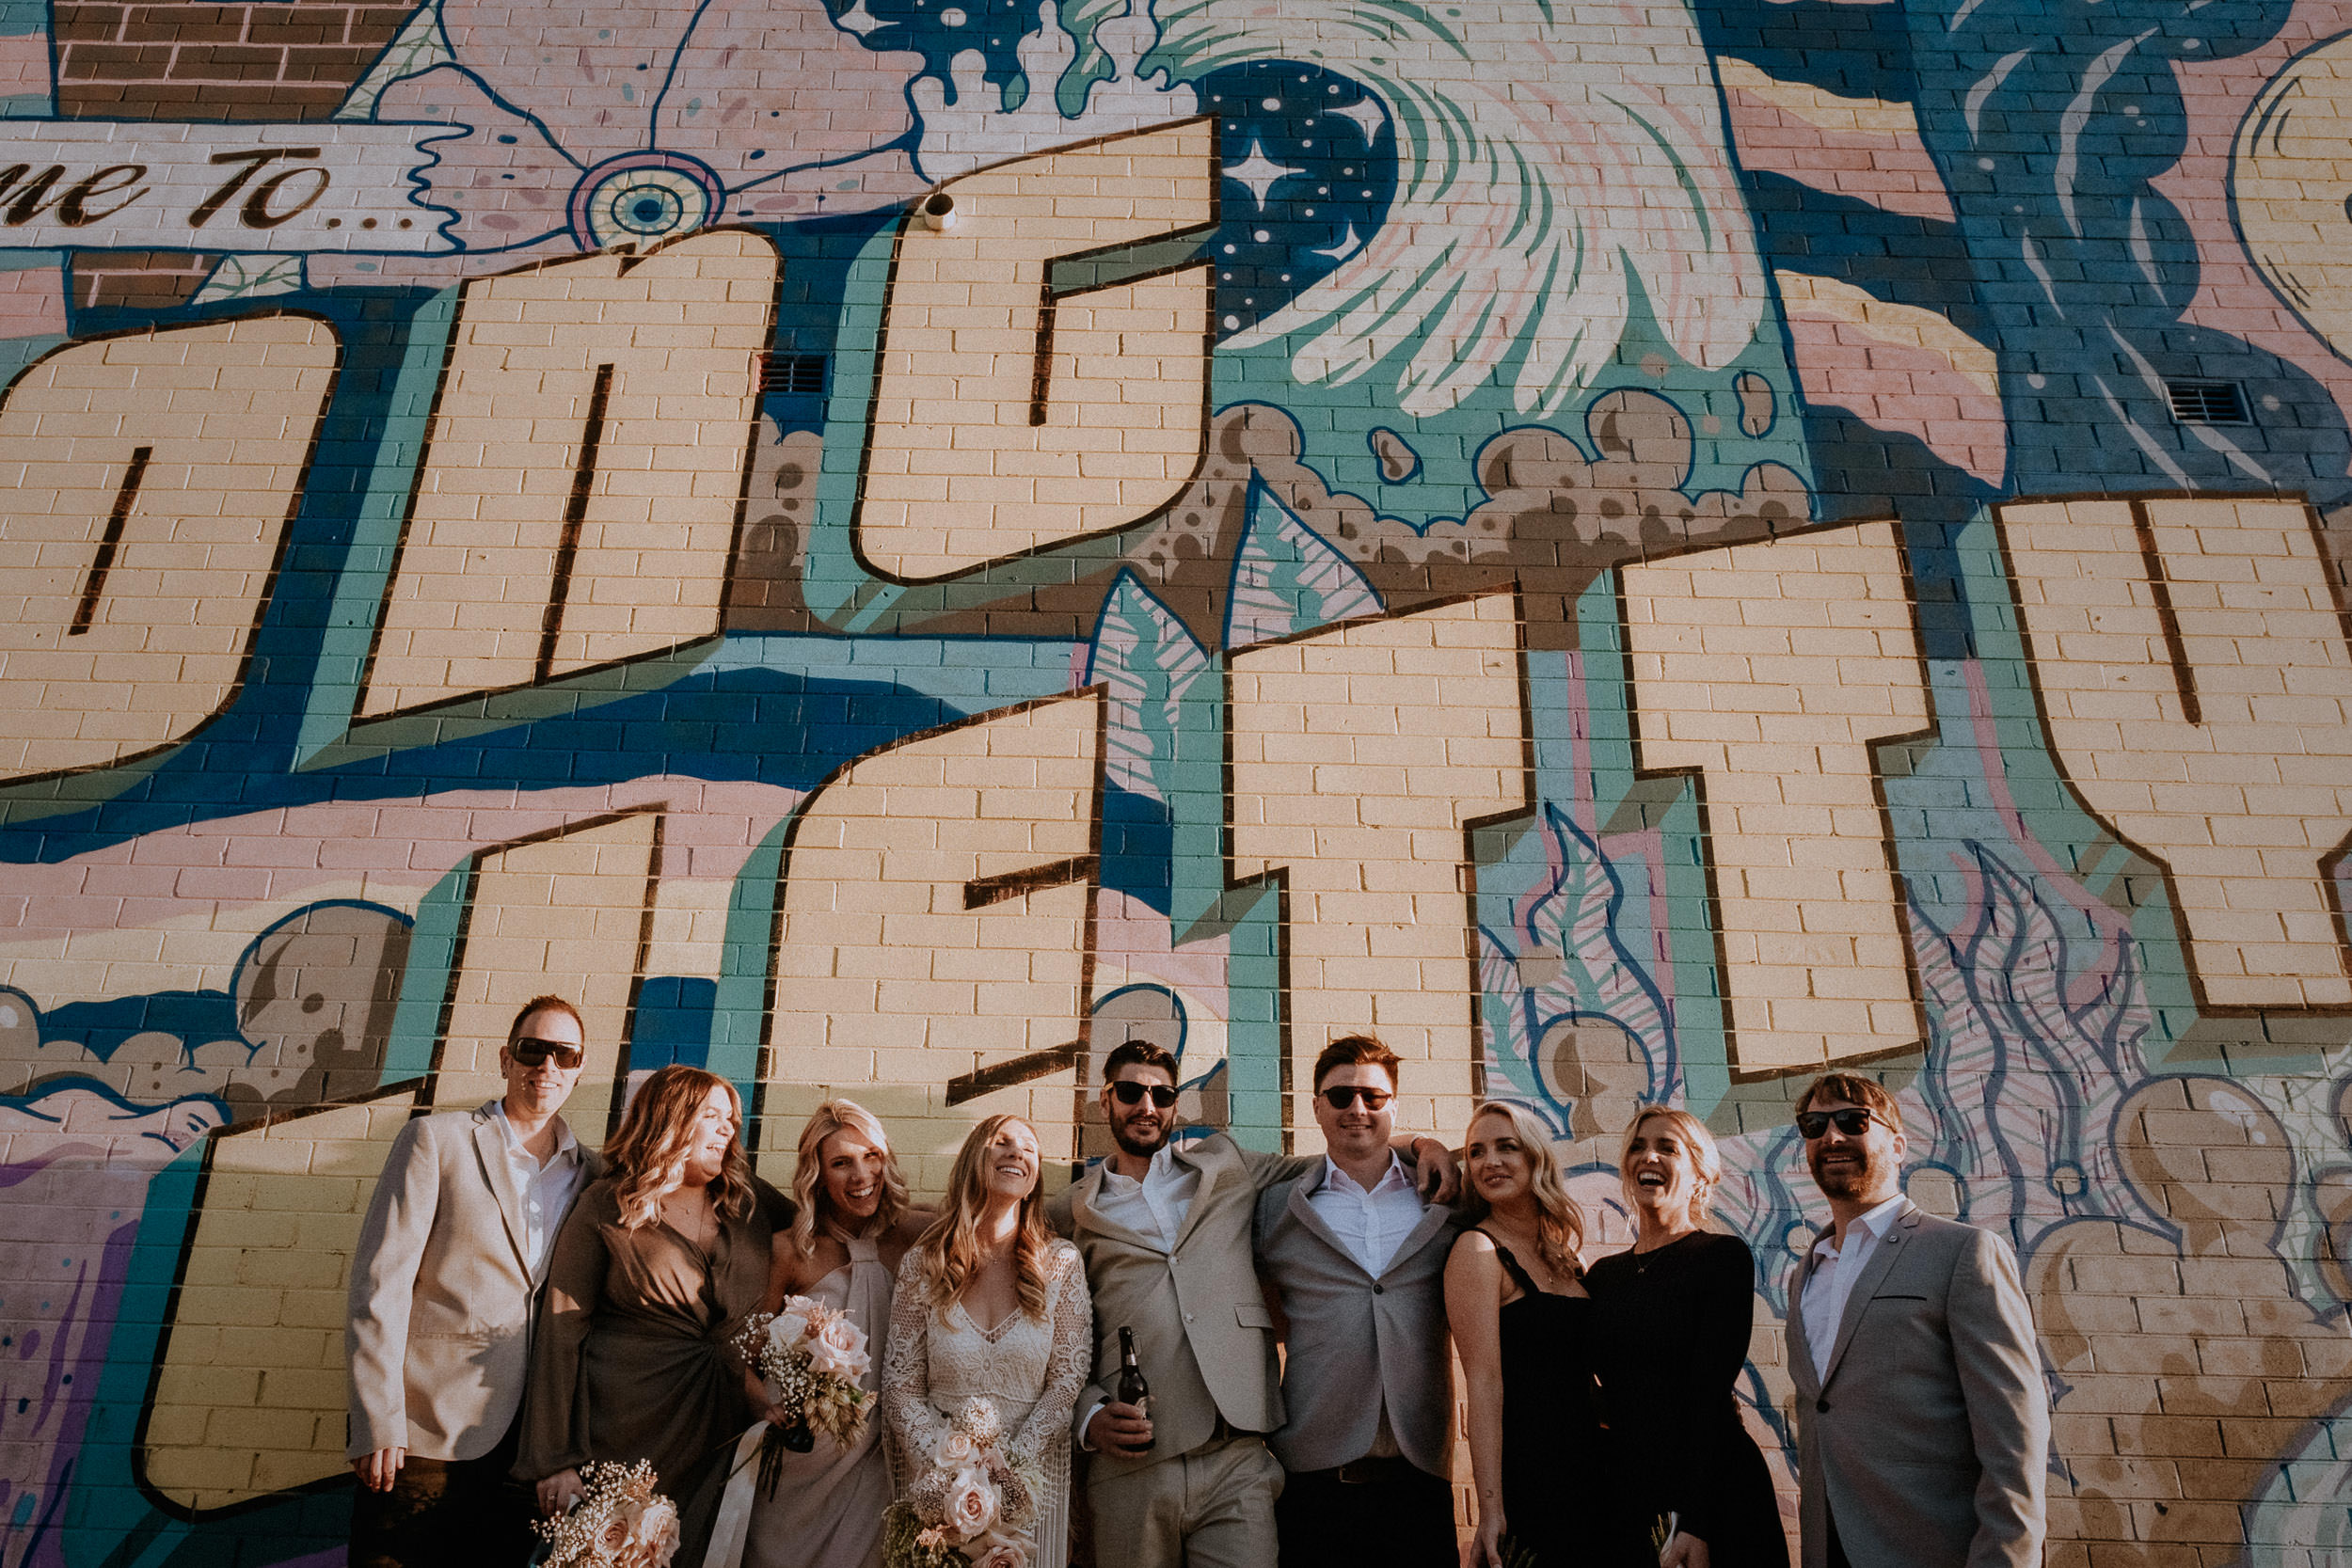 S&A Elopement - Kings & Thieves - Shred 'Til Dead - Central Coast Beach Forest Wedding - 346.jpg